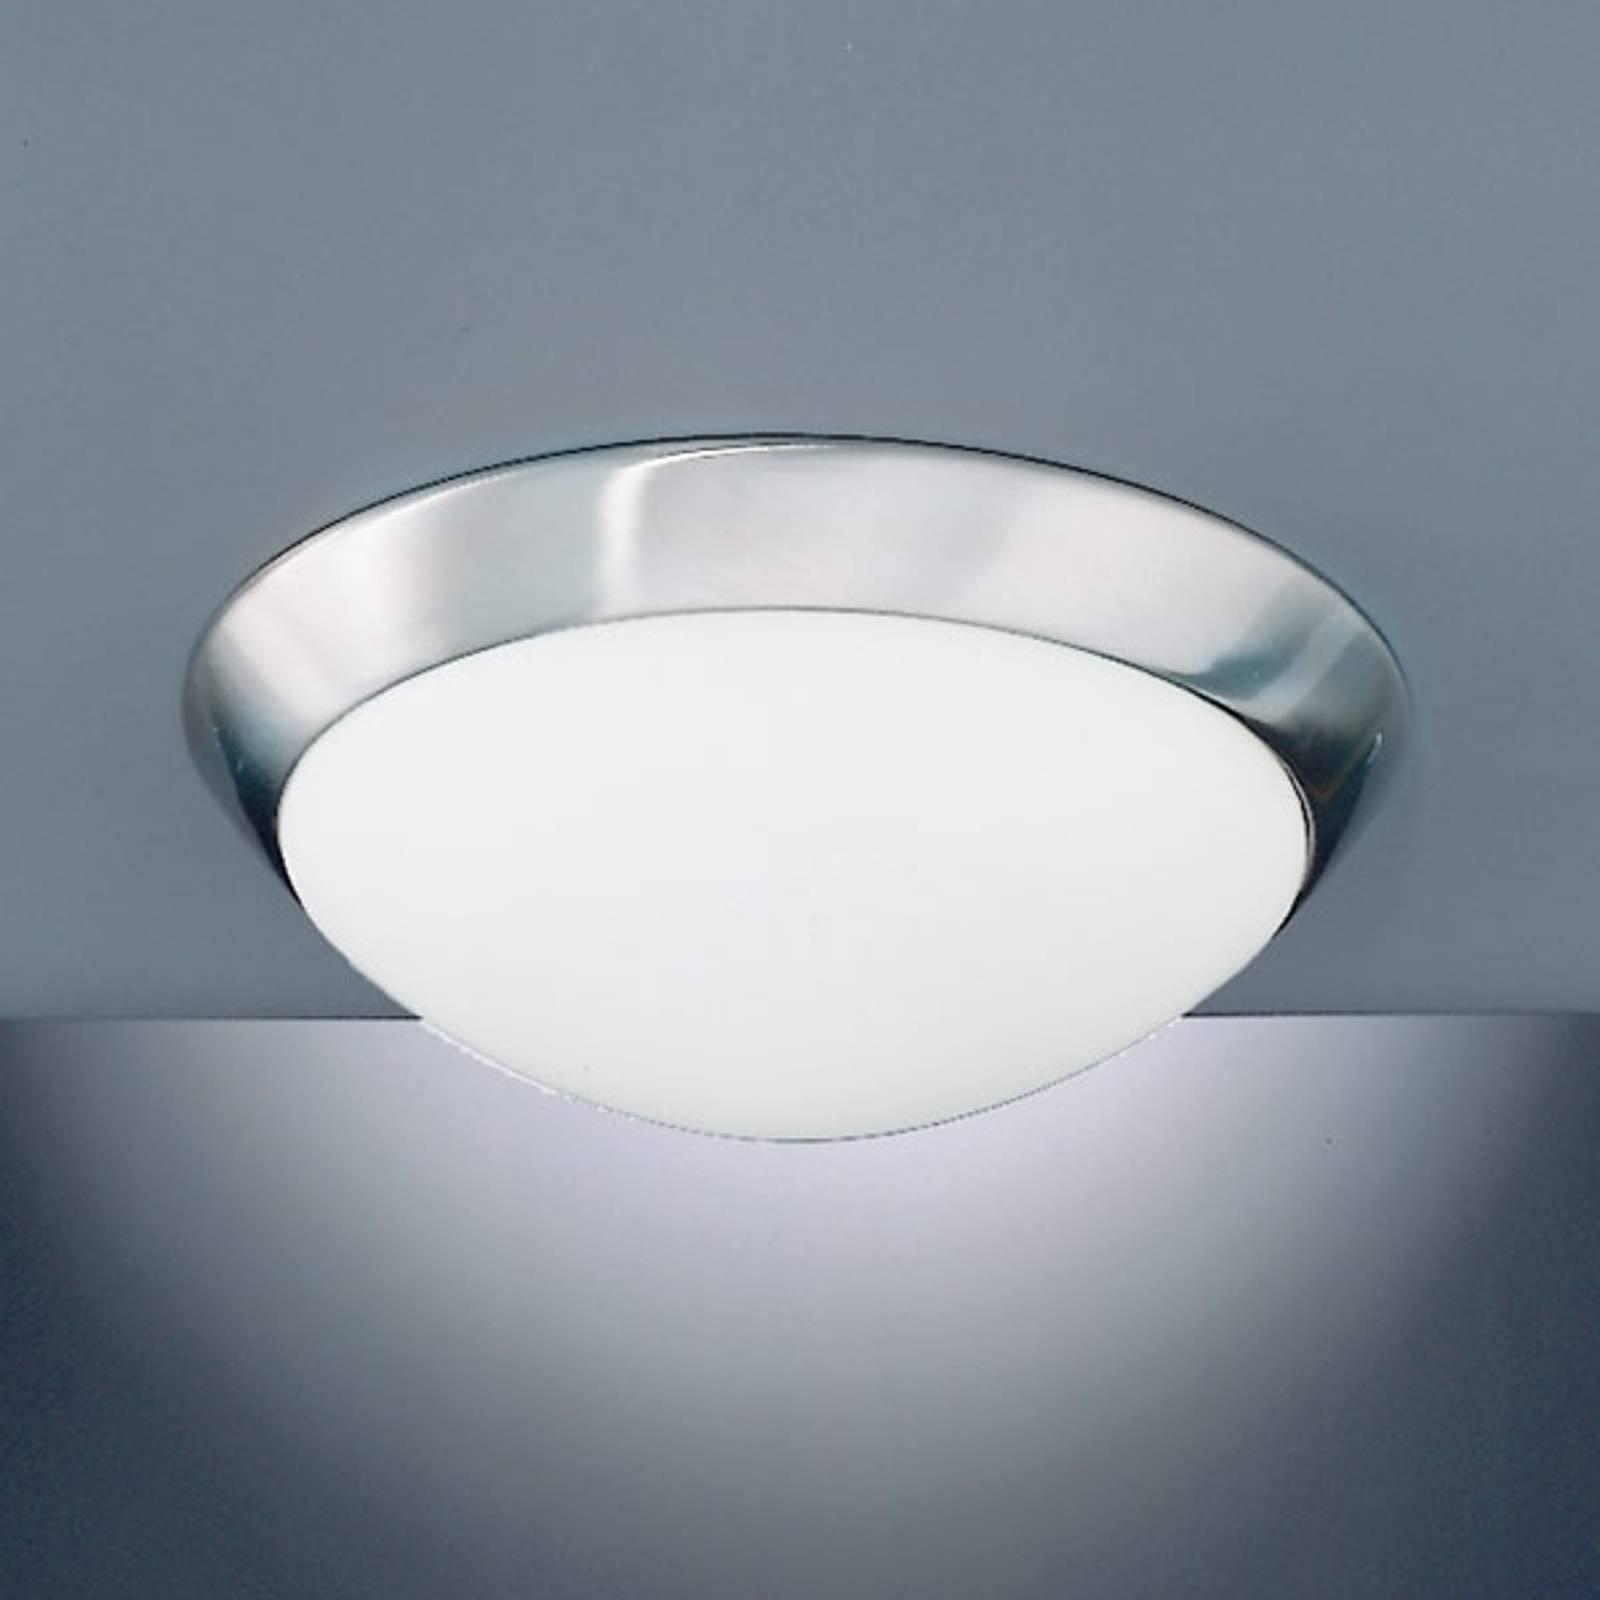 Ładna lampa sufitowa KATRIN IP44, matowy nikiel